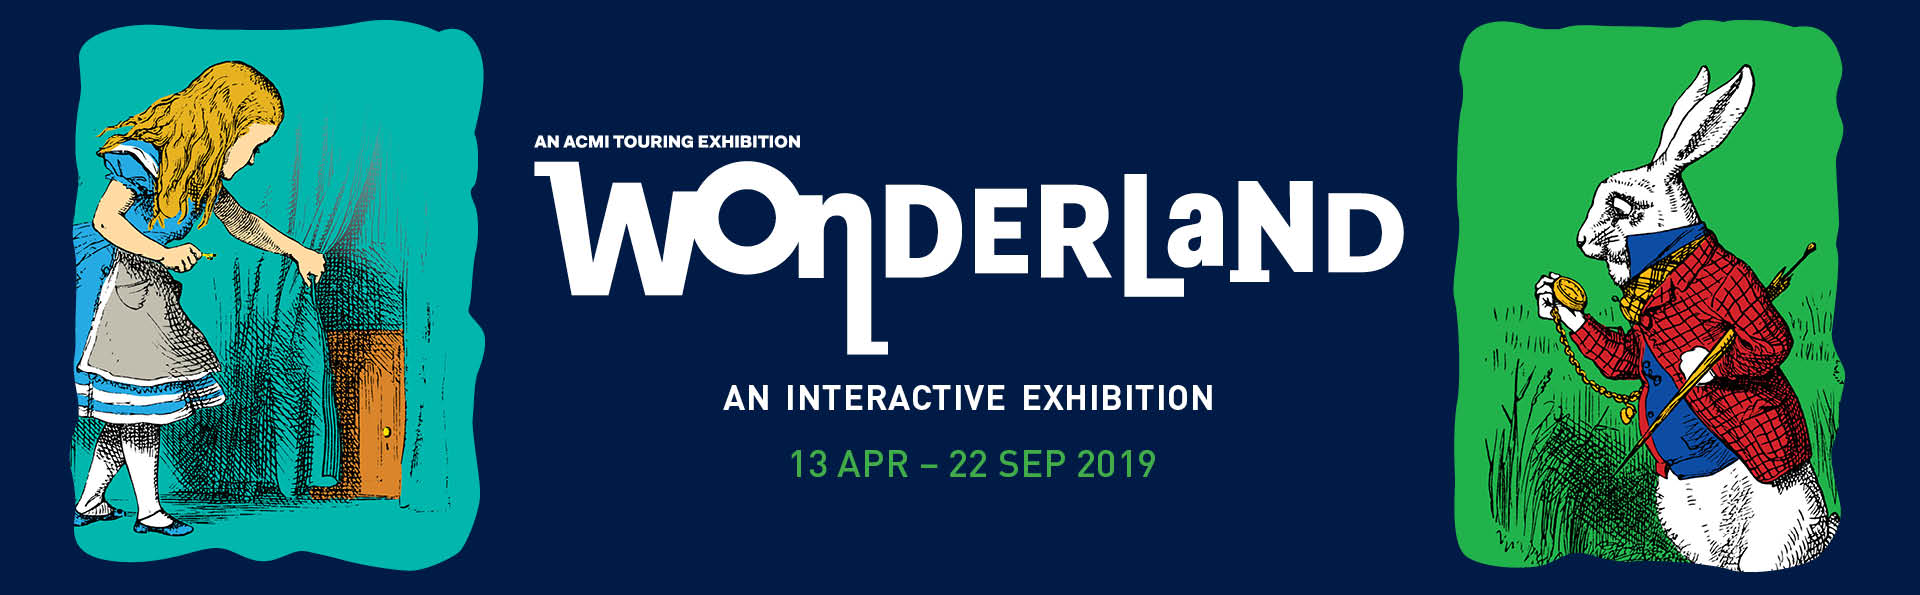 Wonderland-webbanner_1920x595_v6b.jpg